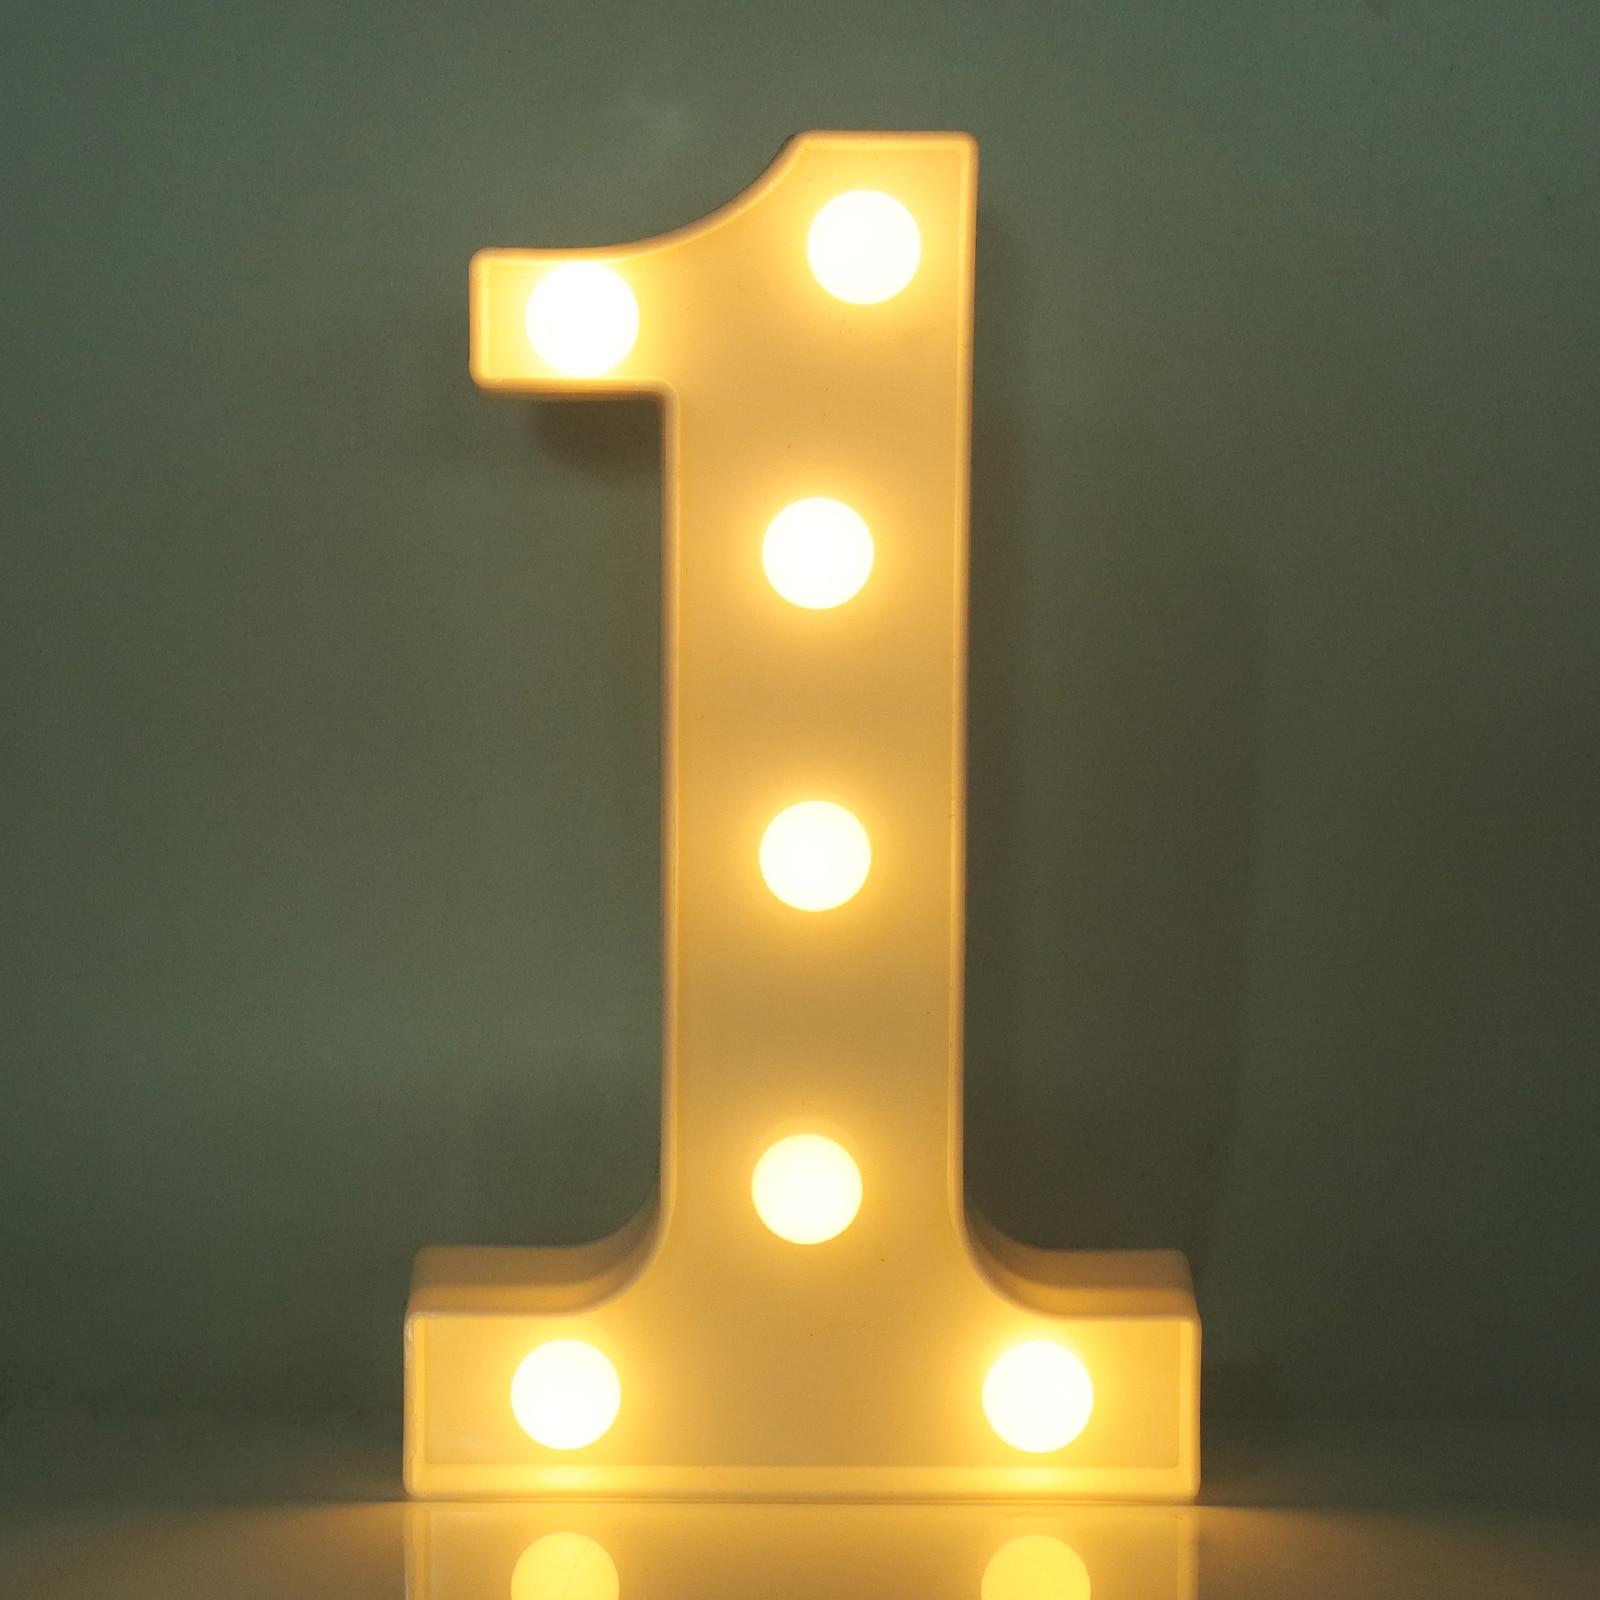 DIY Decoration White Plastic Number Battery Led Light